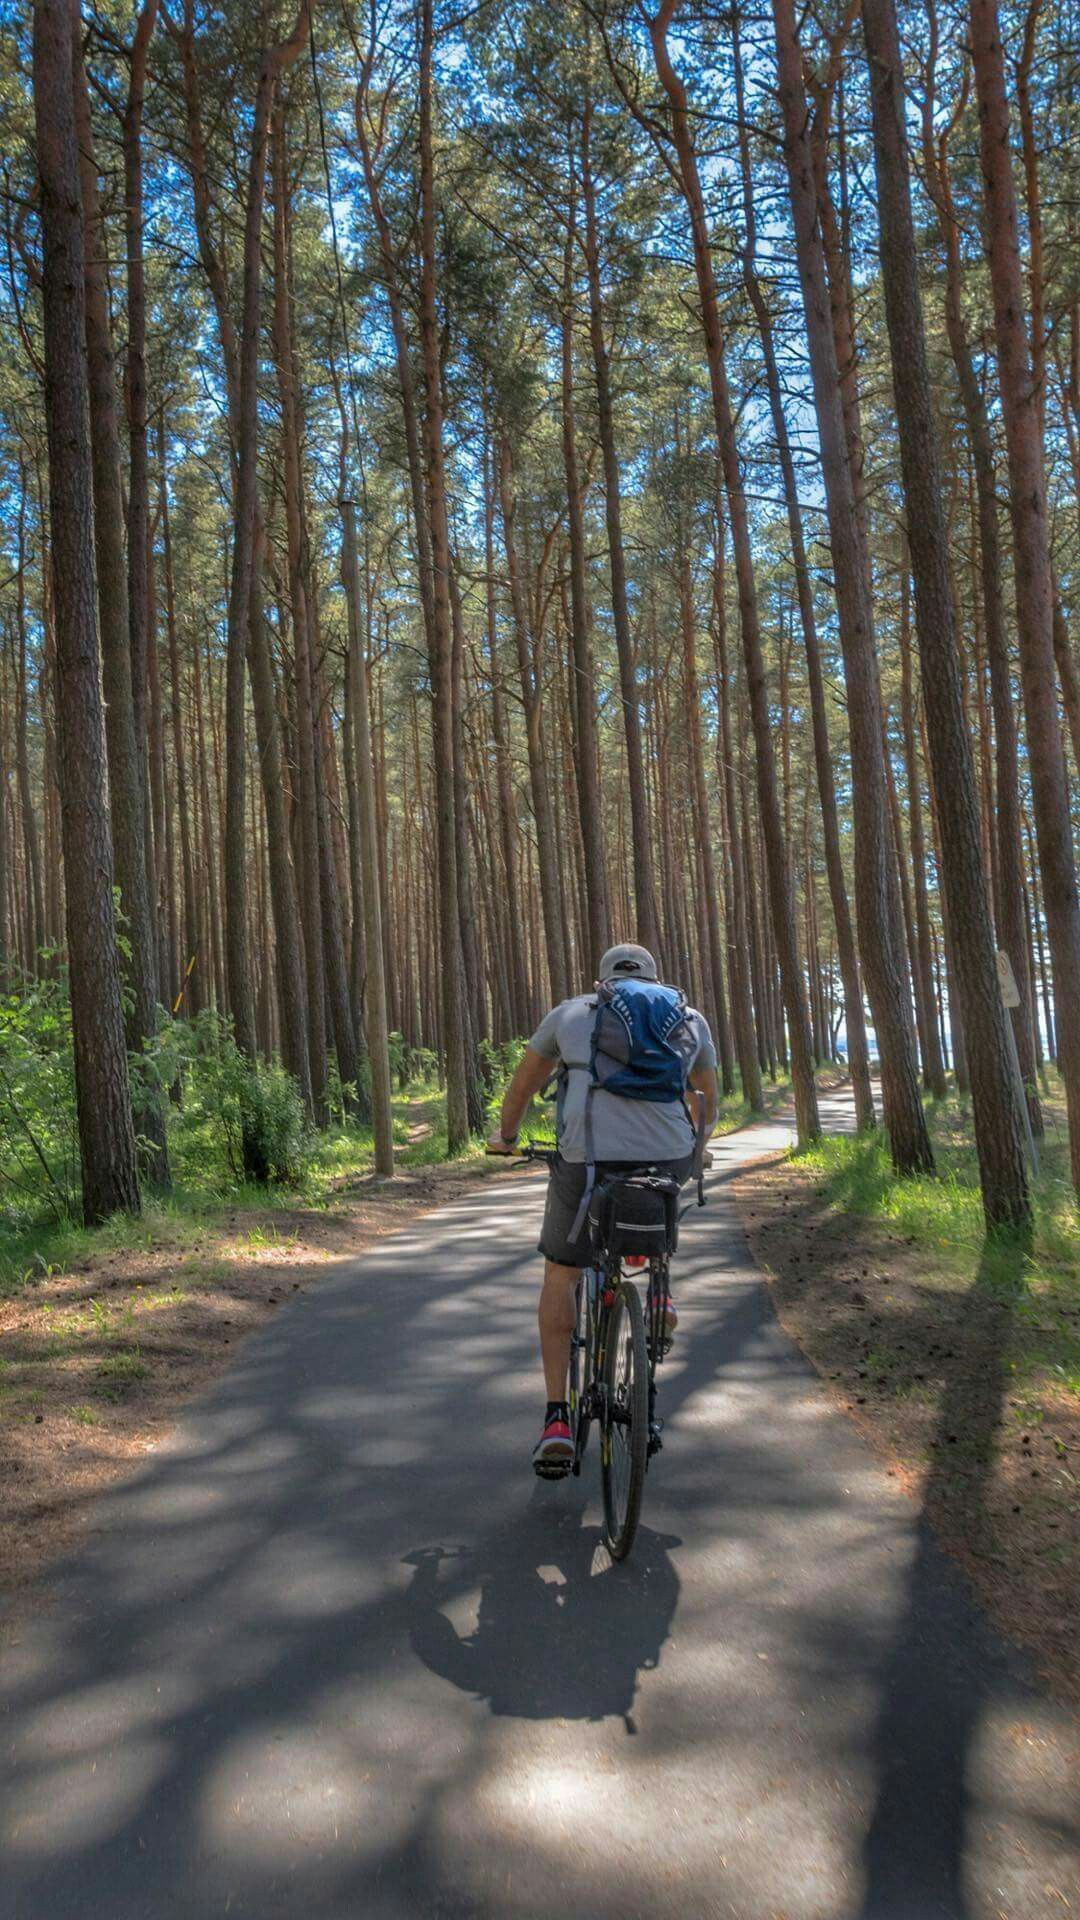 Life Is Like Riding A Bicycle To Stay Balanced You Must Keep Moving الحياة مثل ركوب الدراجة لكي تحافظ على توازنك لابد منك أن تستمر في ا Faz3 Esportes